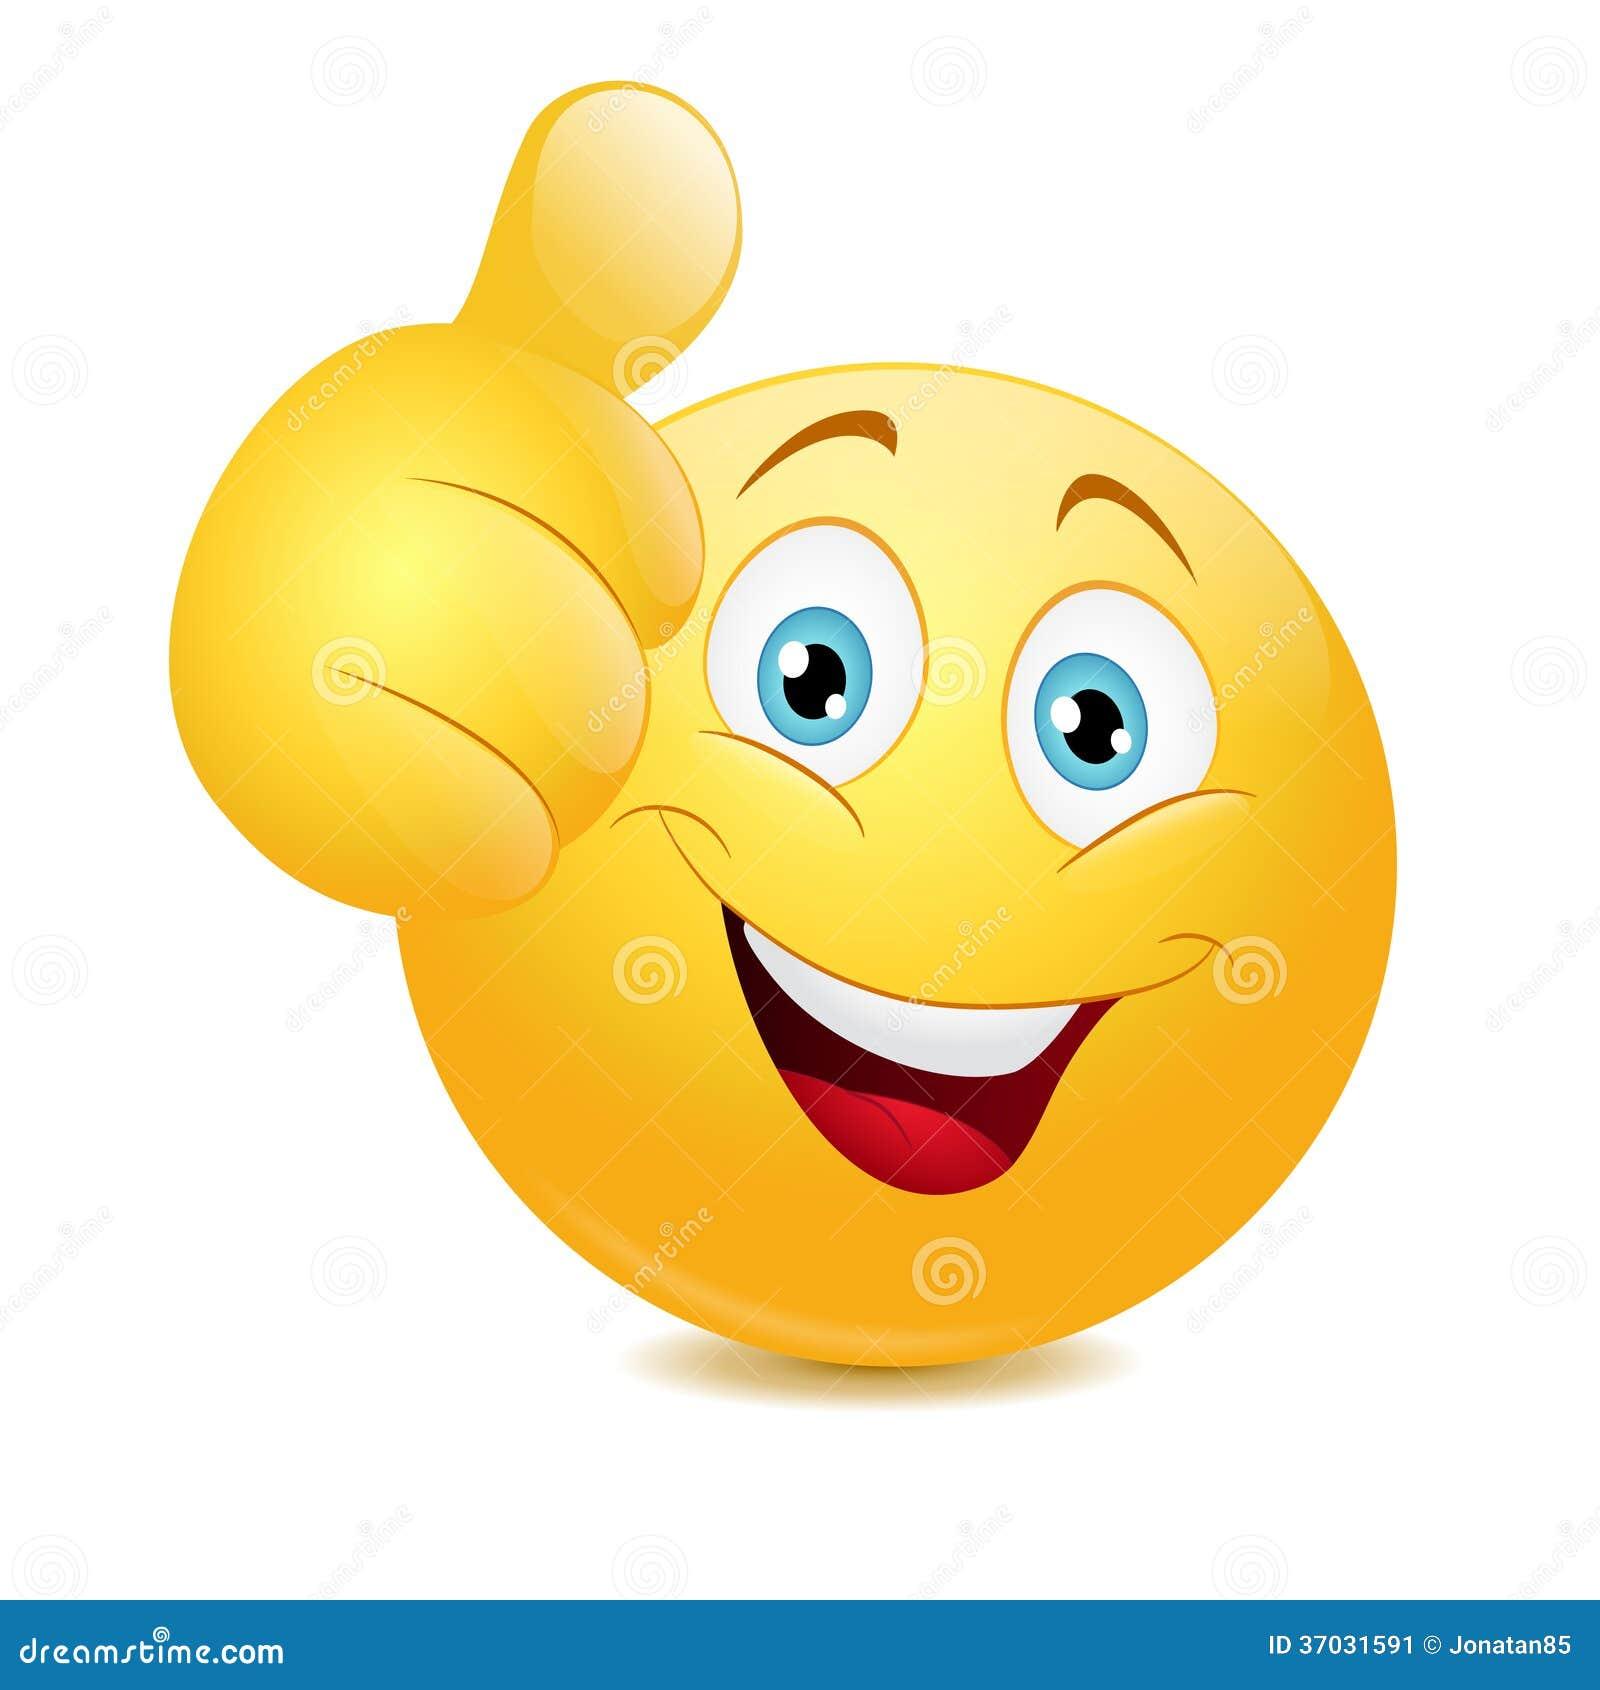 Emoticon Showing Thumb Up Stock Image - Image: 37031591